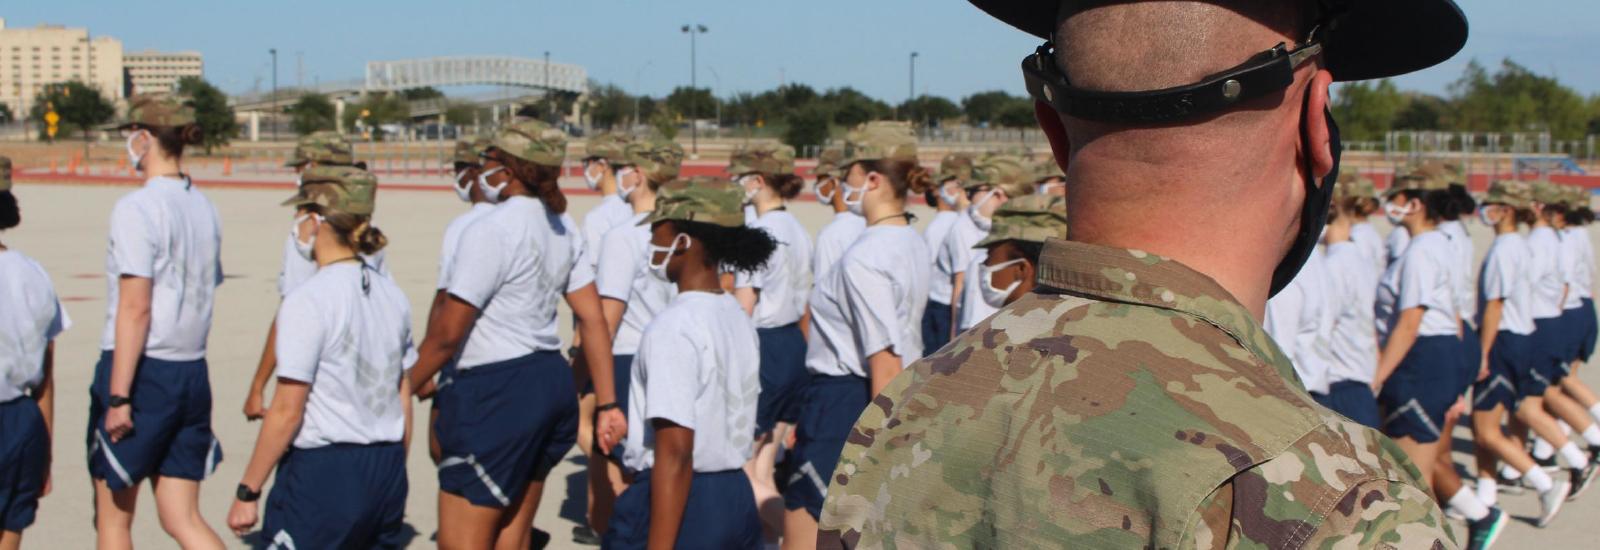 Air Force Basic Training Phases